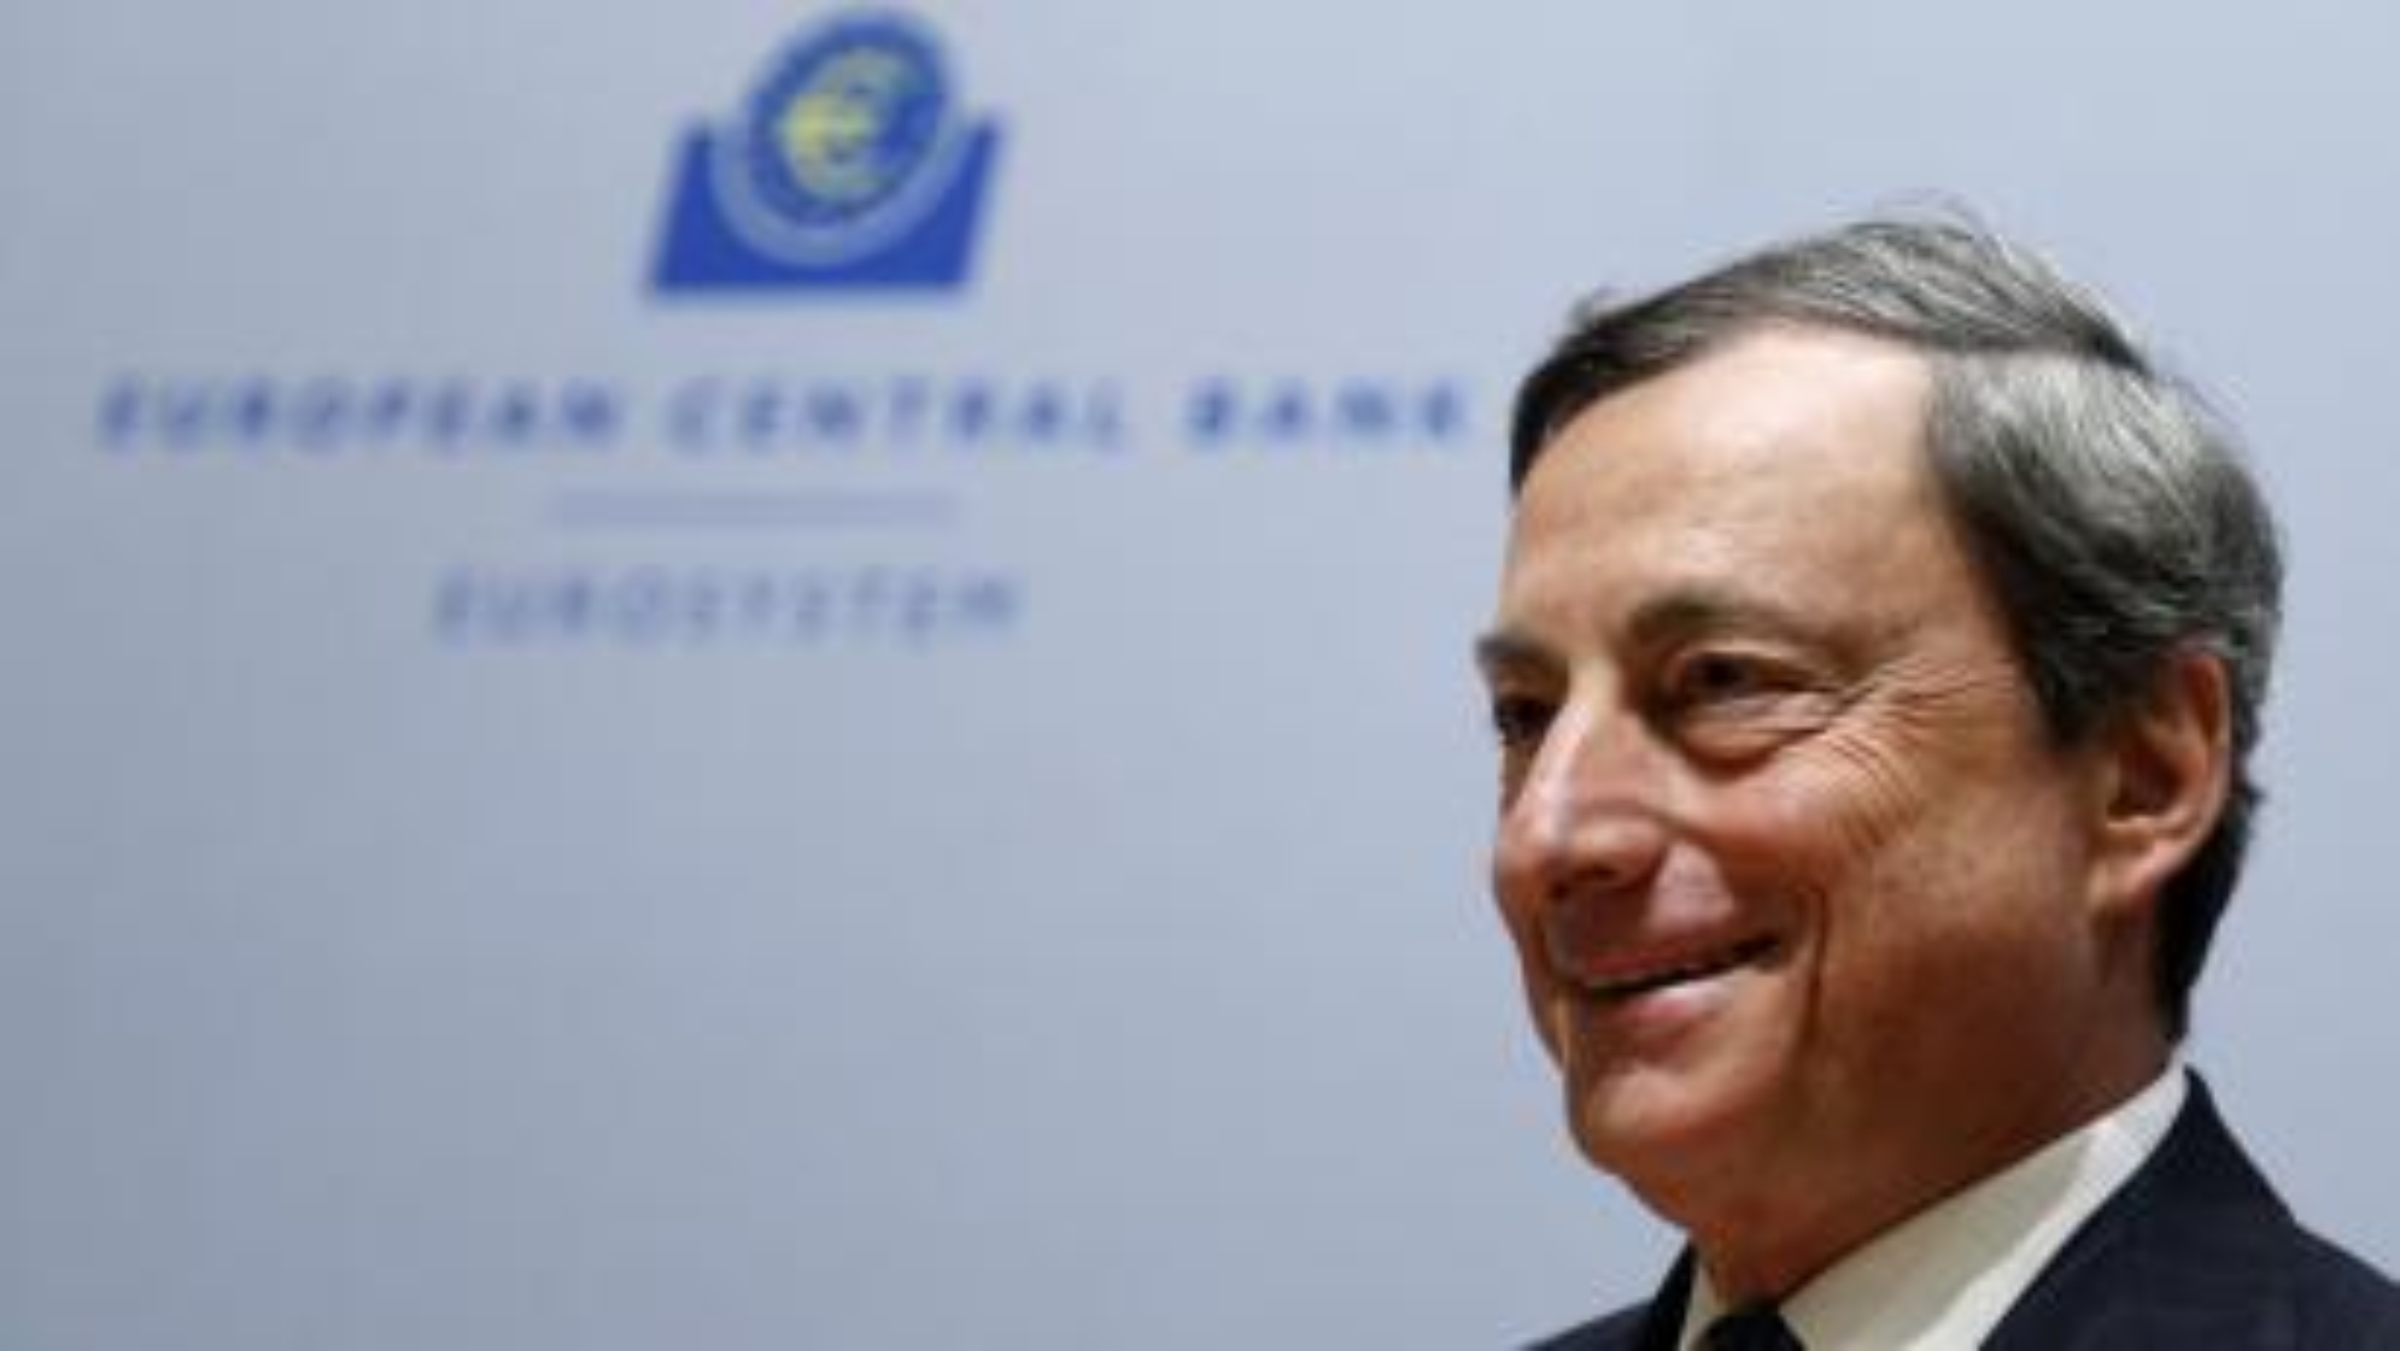 Mario-Draghi-ECB-QE-Action